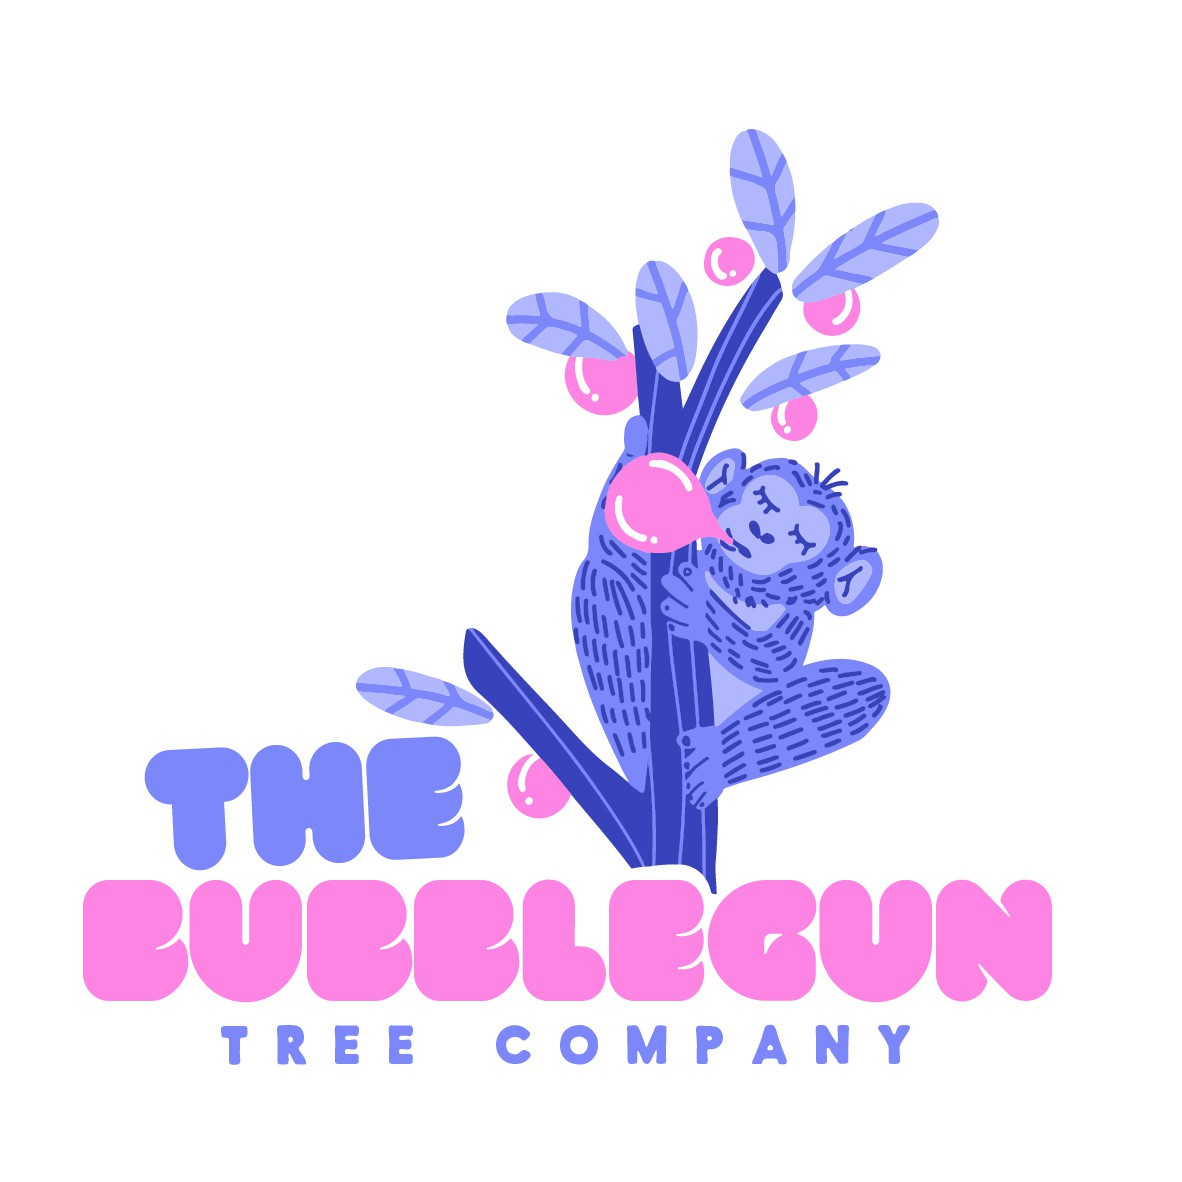 logo design trends example: Blue purple monkey illustration logo design